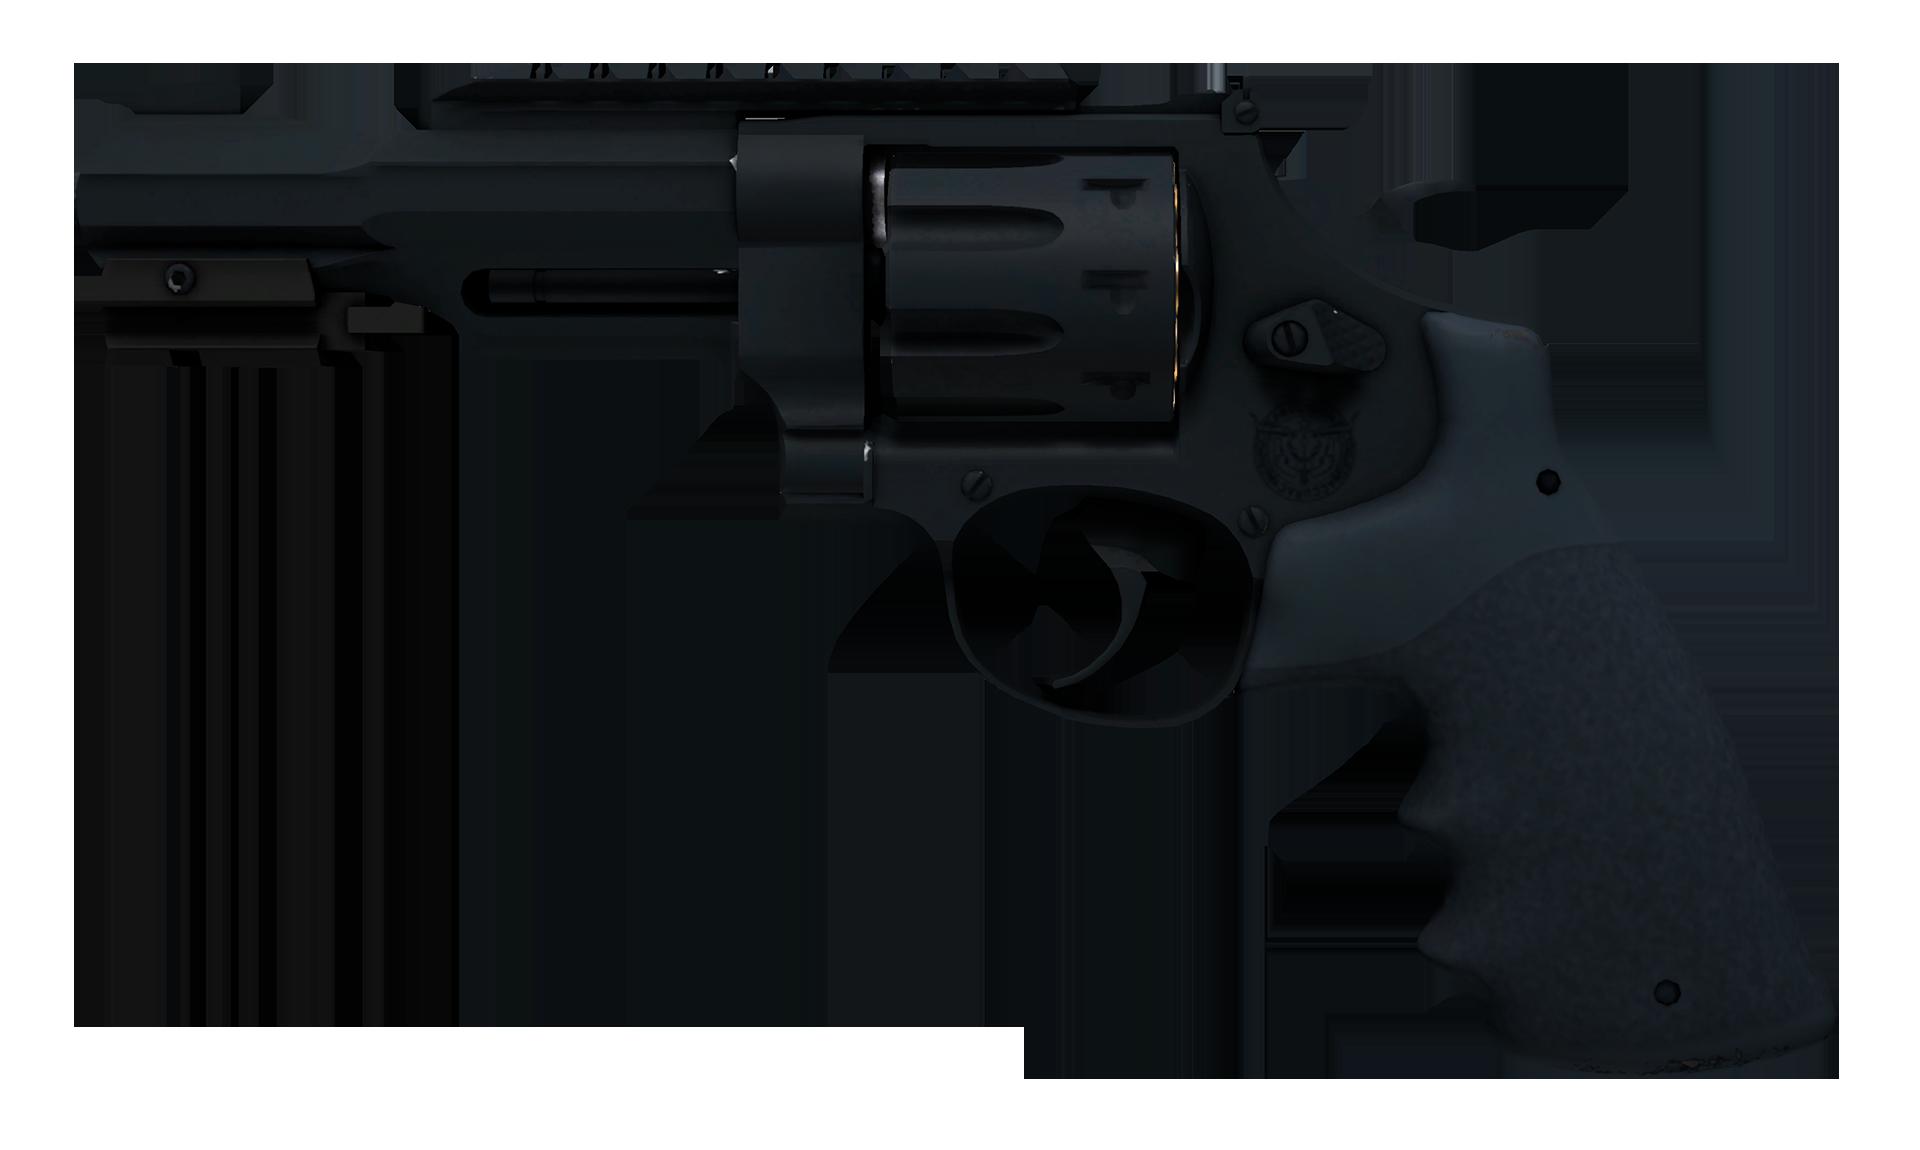 R8 Revolver Night Large Rendering